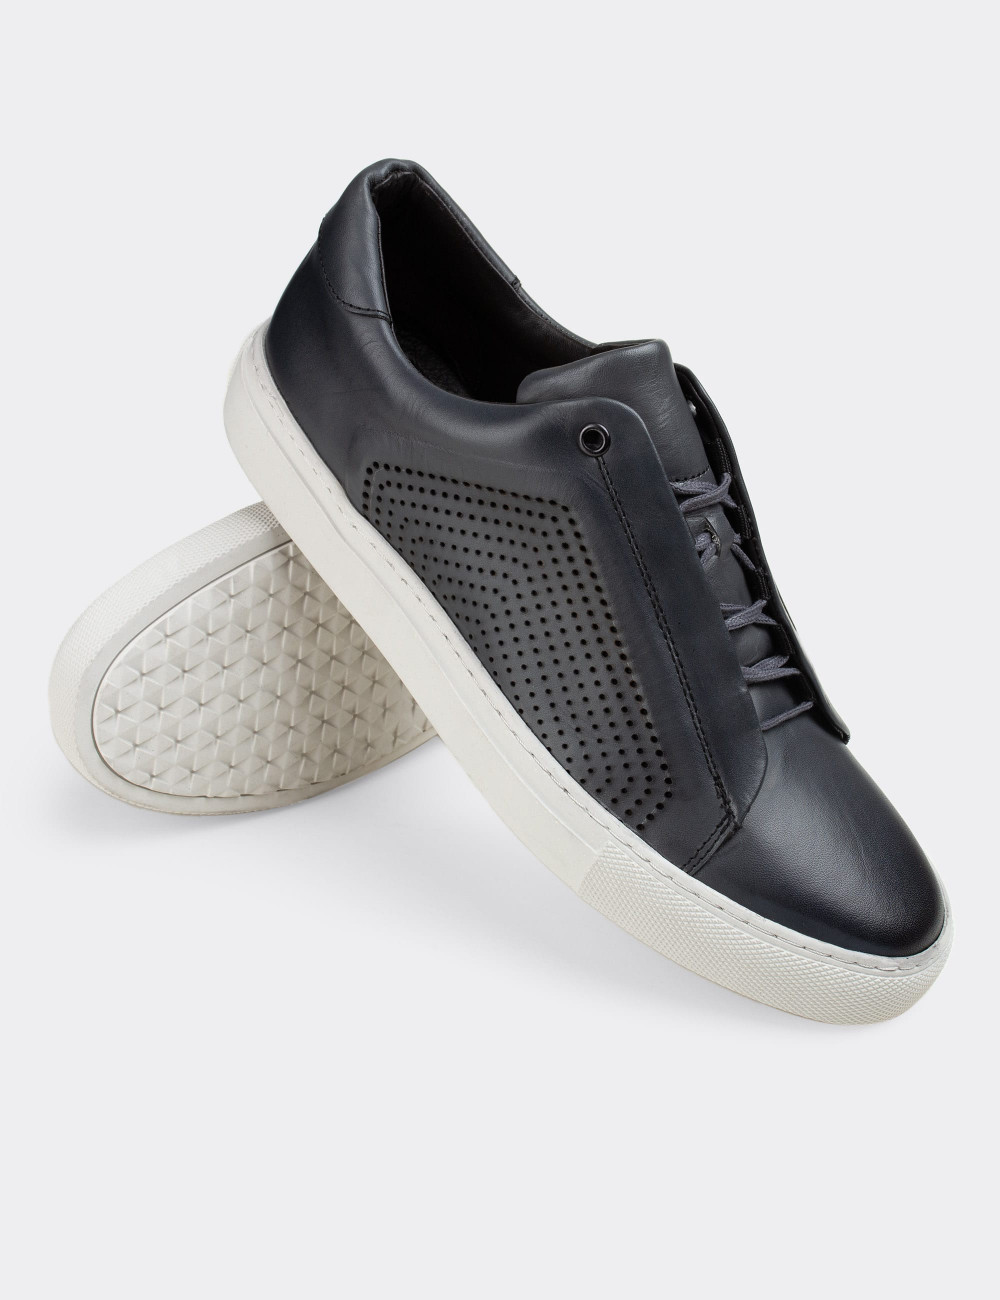 Hakiki Deri Gri Sneaker Erkek Ayakkabı - 01834MGRIC01